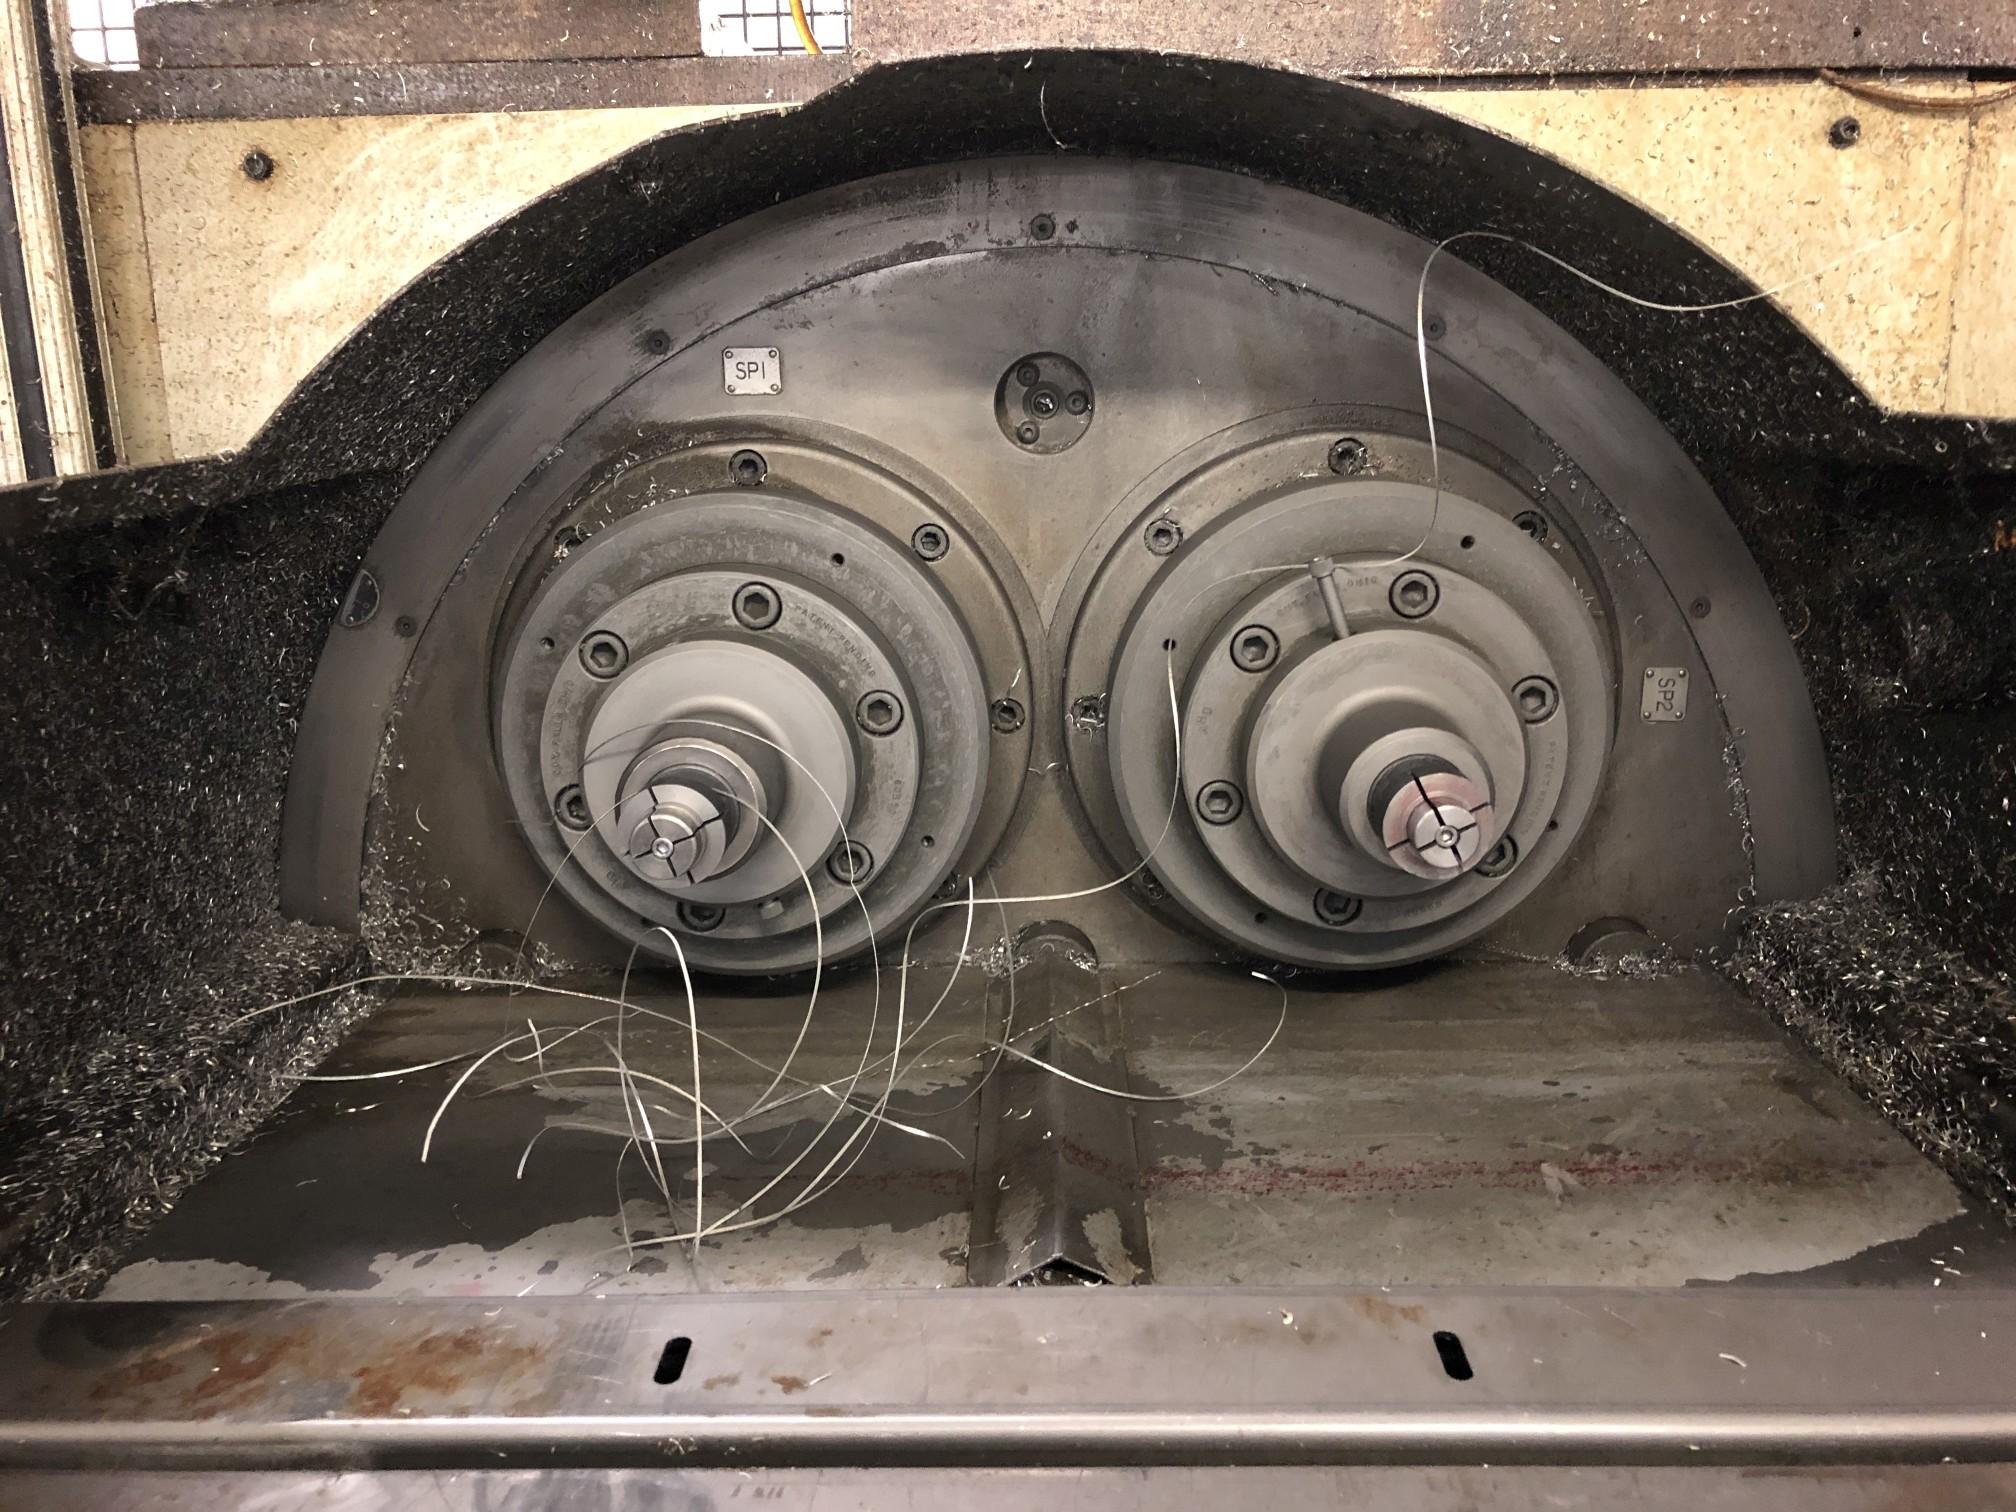 1999 Kitako MT4-200 Multi-Spindle CNC Turning Mill - Image 2 of 16